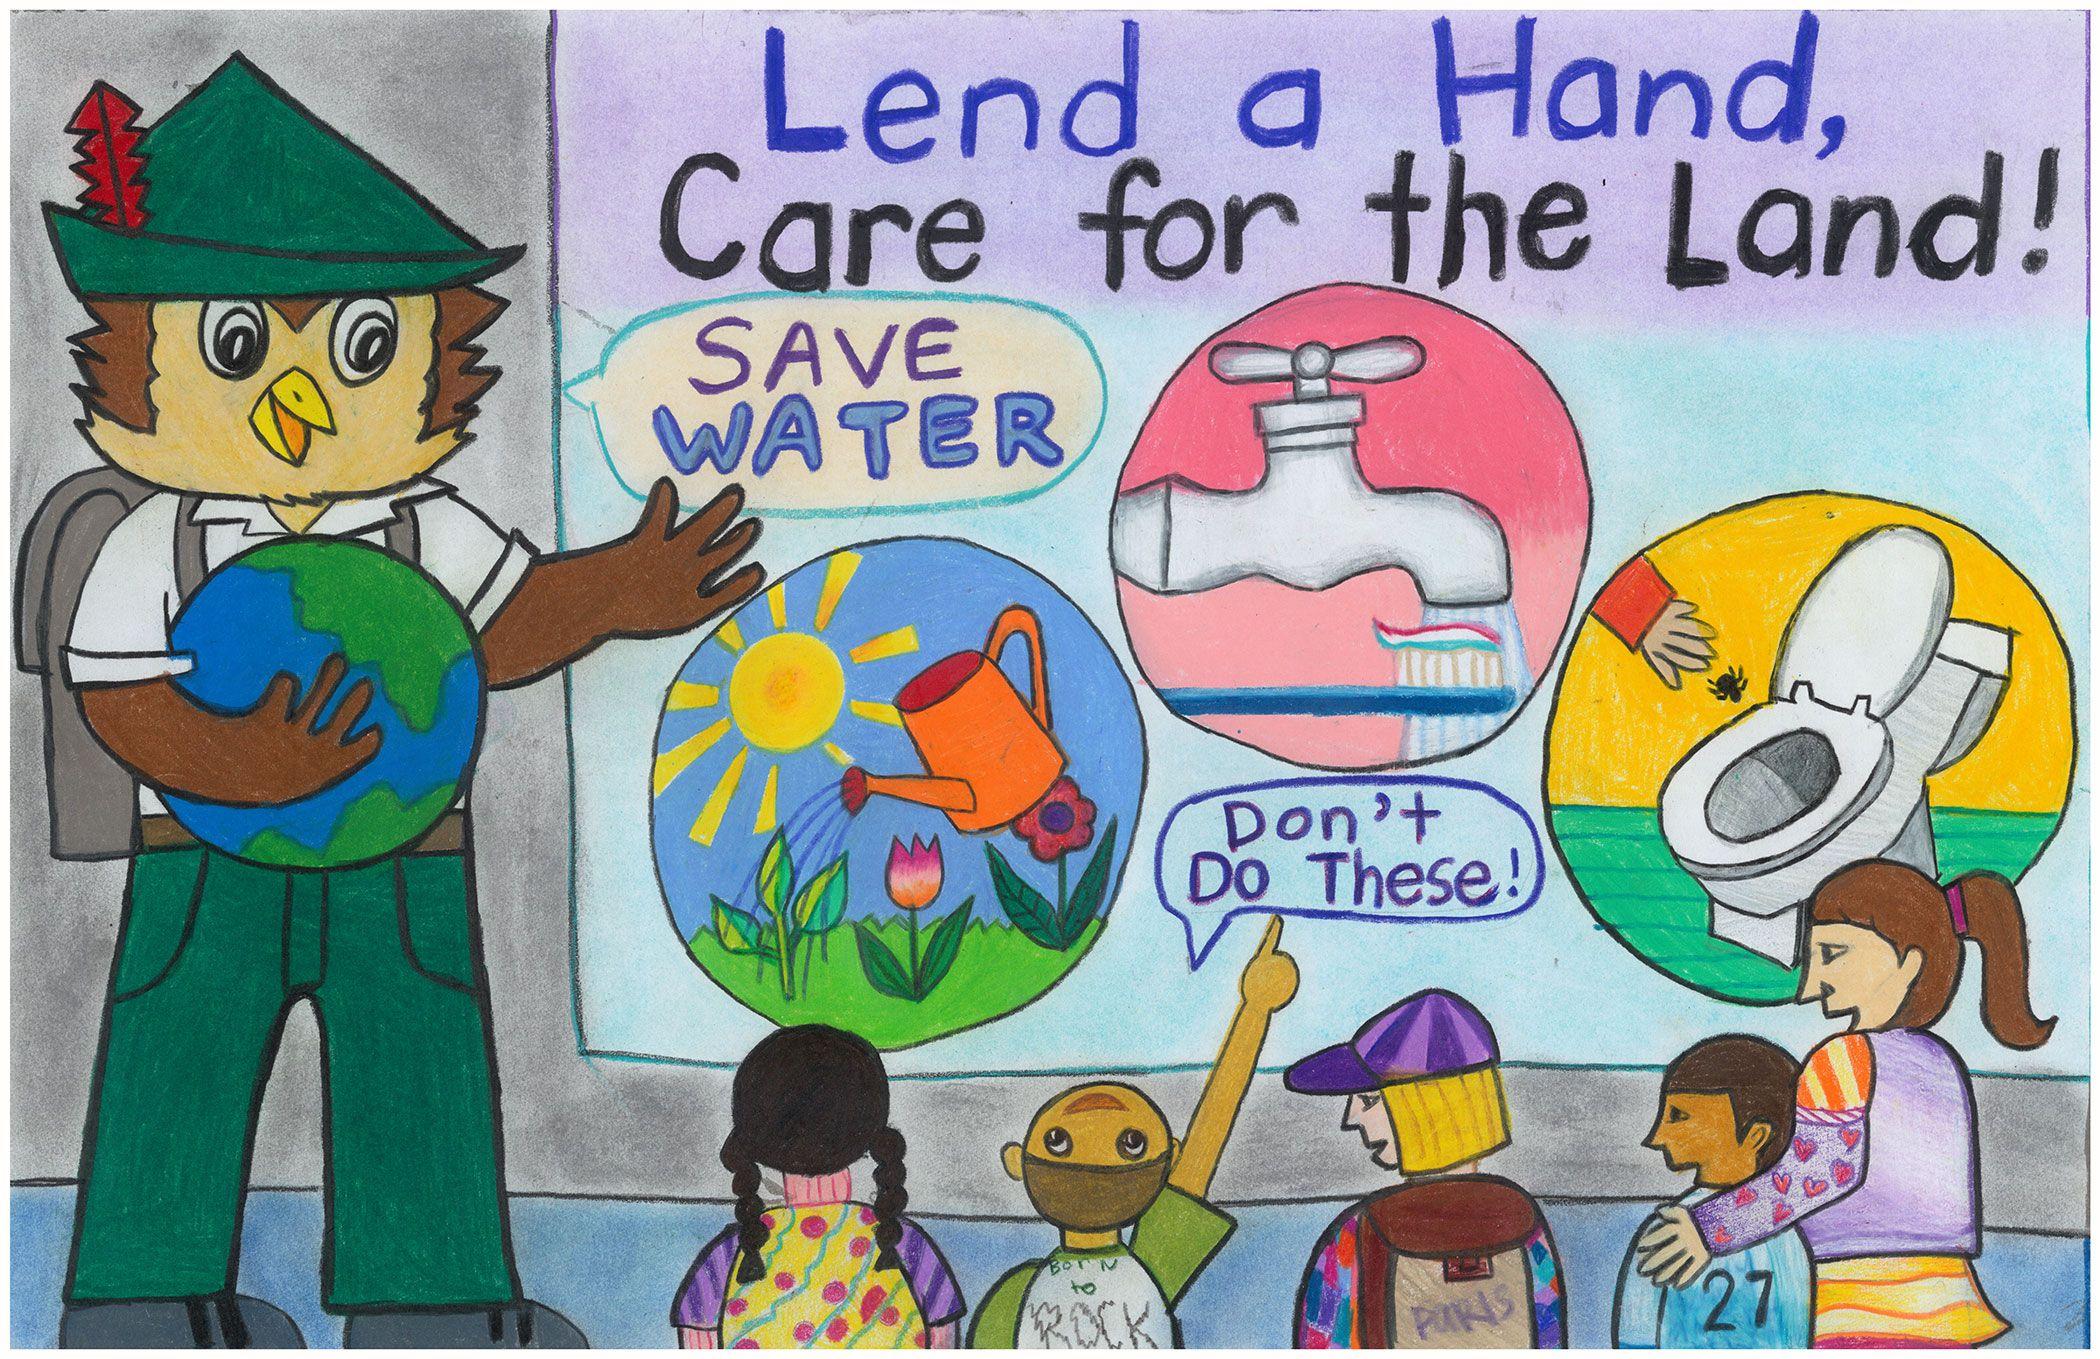 Go Green Gambar Poster Adiwiyata Yang Mudah Digambar